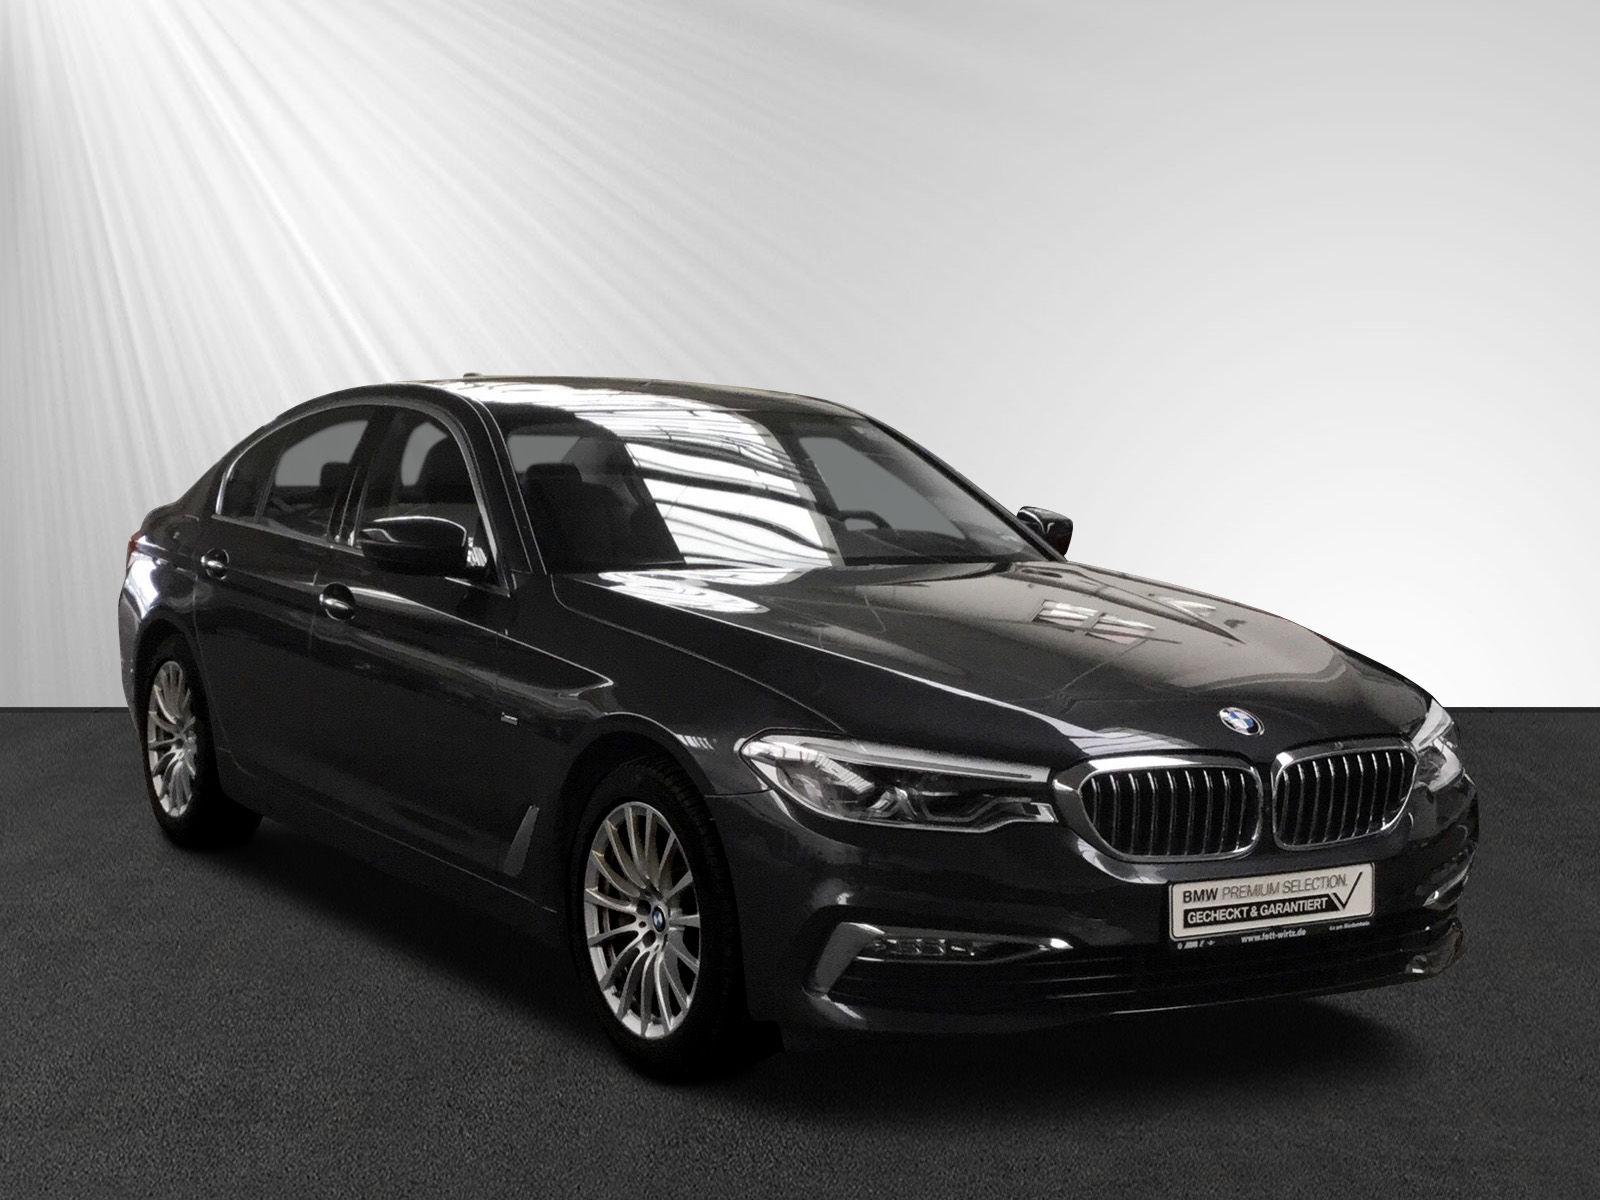 BMW 540i Luxury AHK Komforts.-+Lüft GSD HUD DA PA+, Jahr 2018, petrol